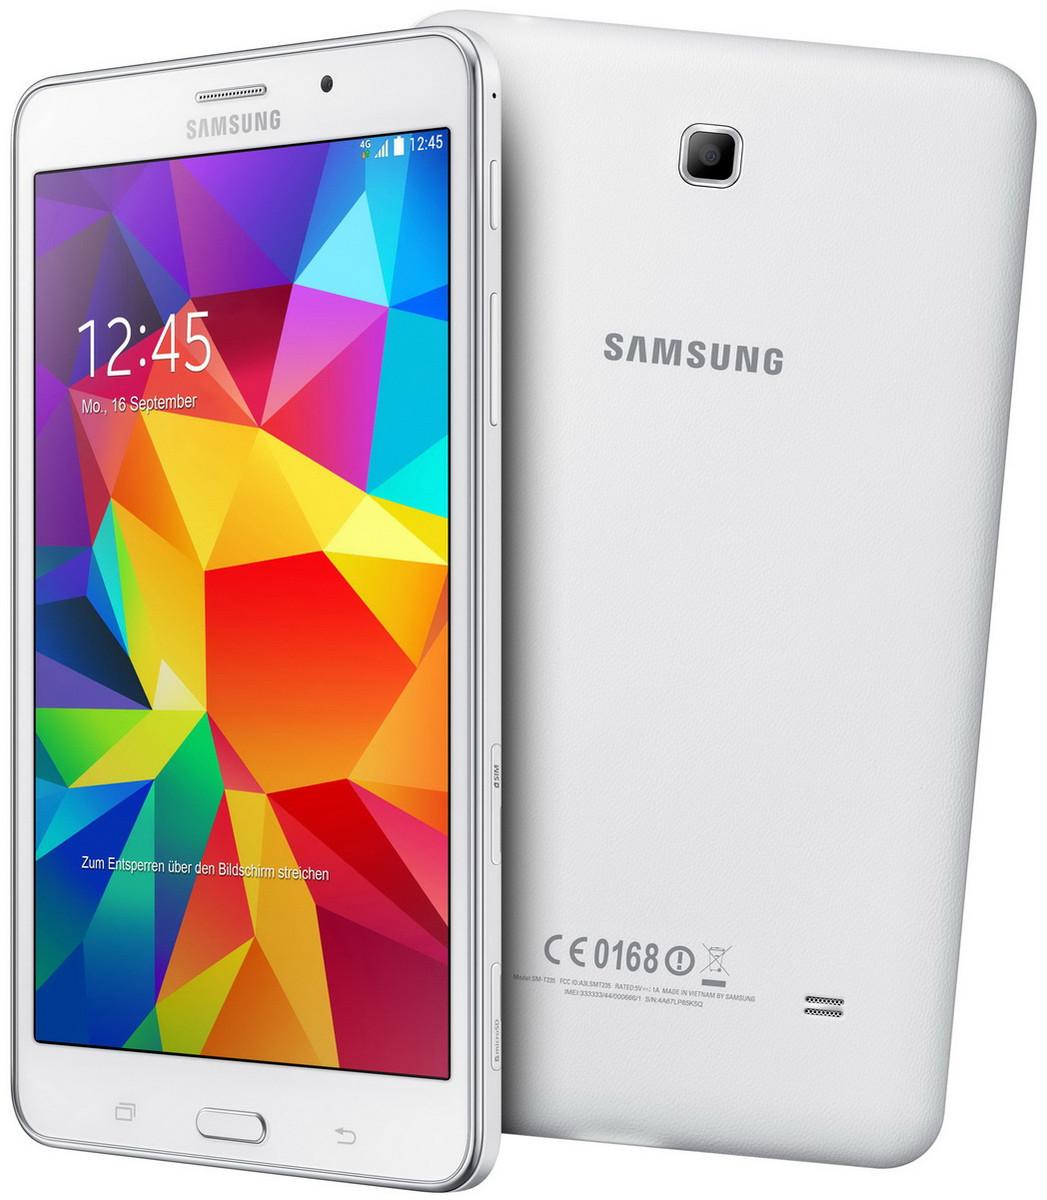 Samsung Galaxy Tab 4 7.0 3G SM-T231